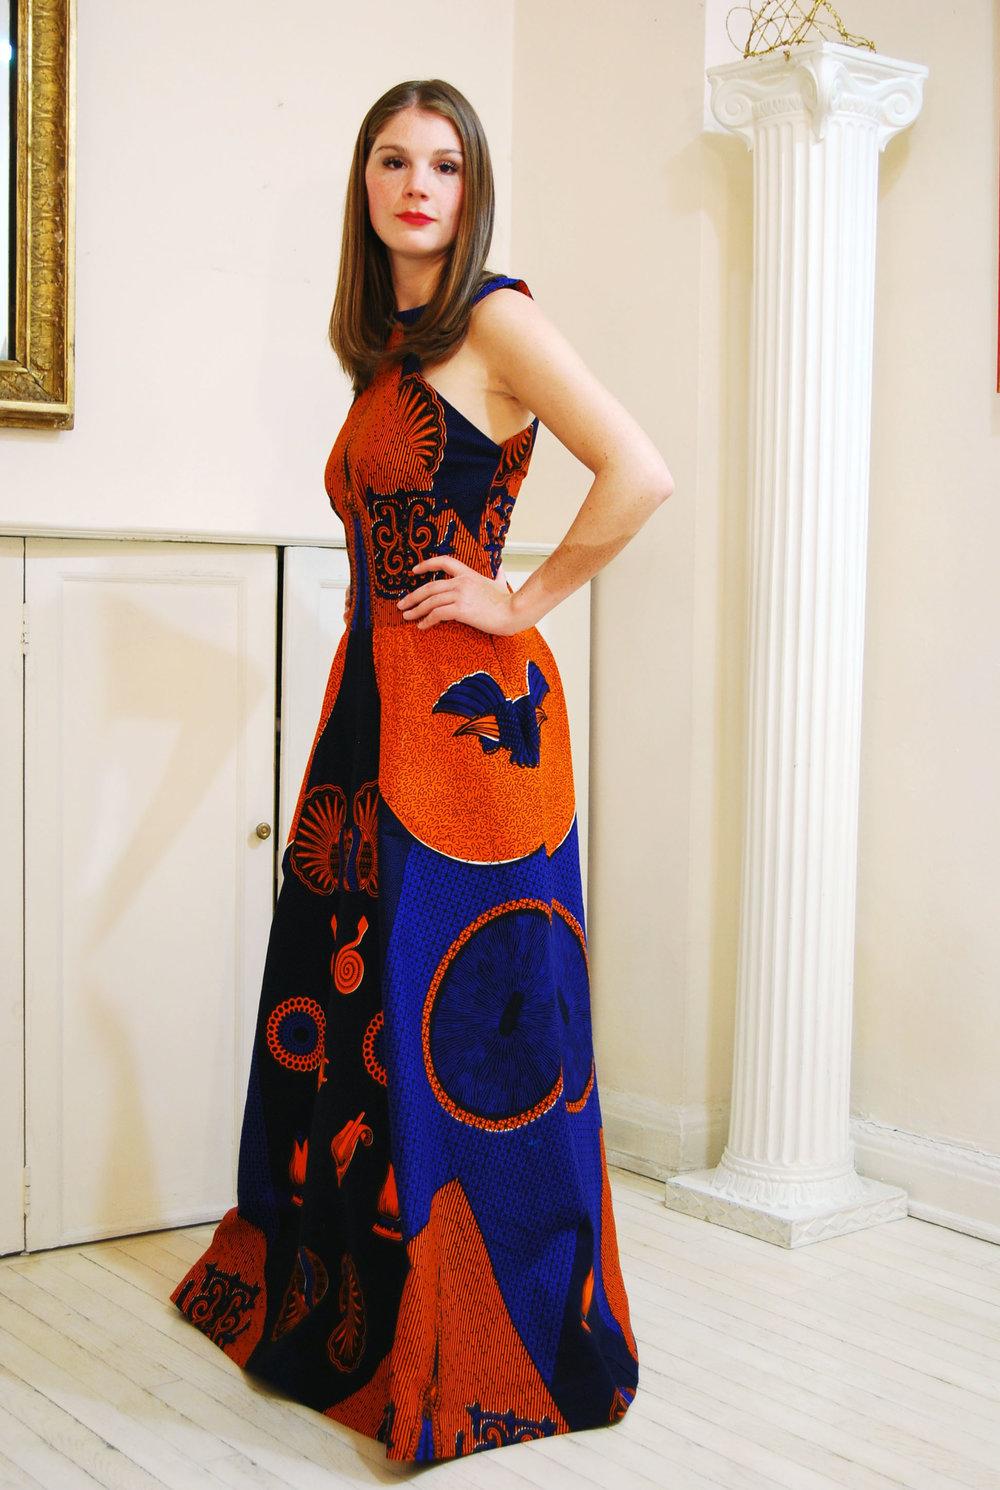 halter-neck cotton wax-print dress - sold